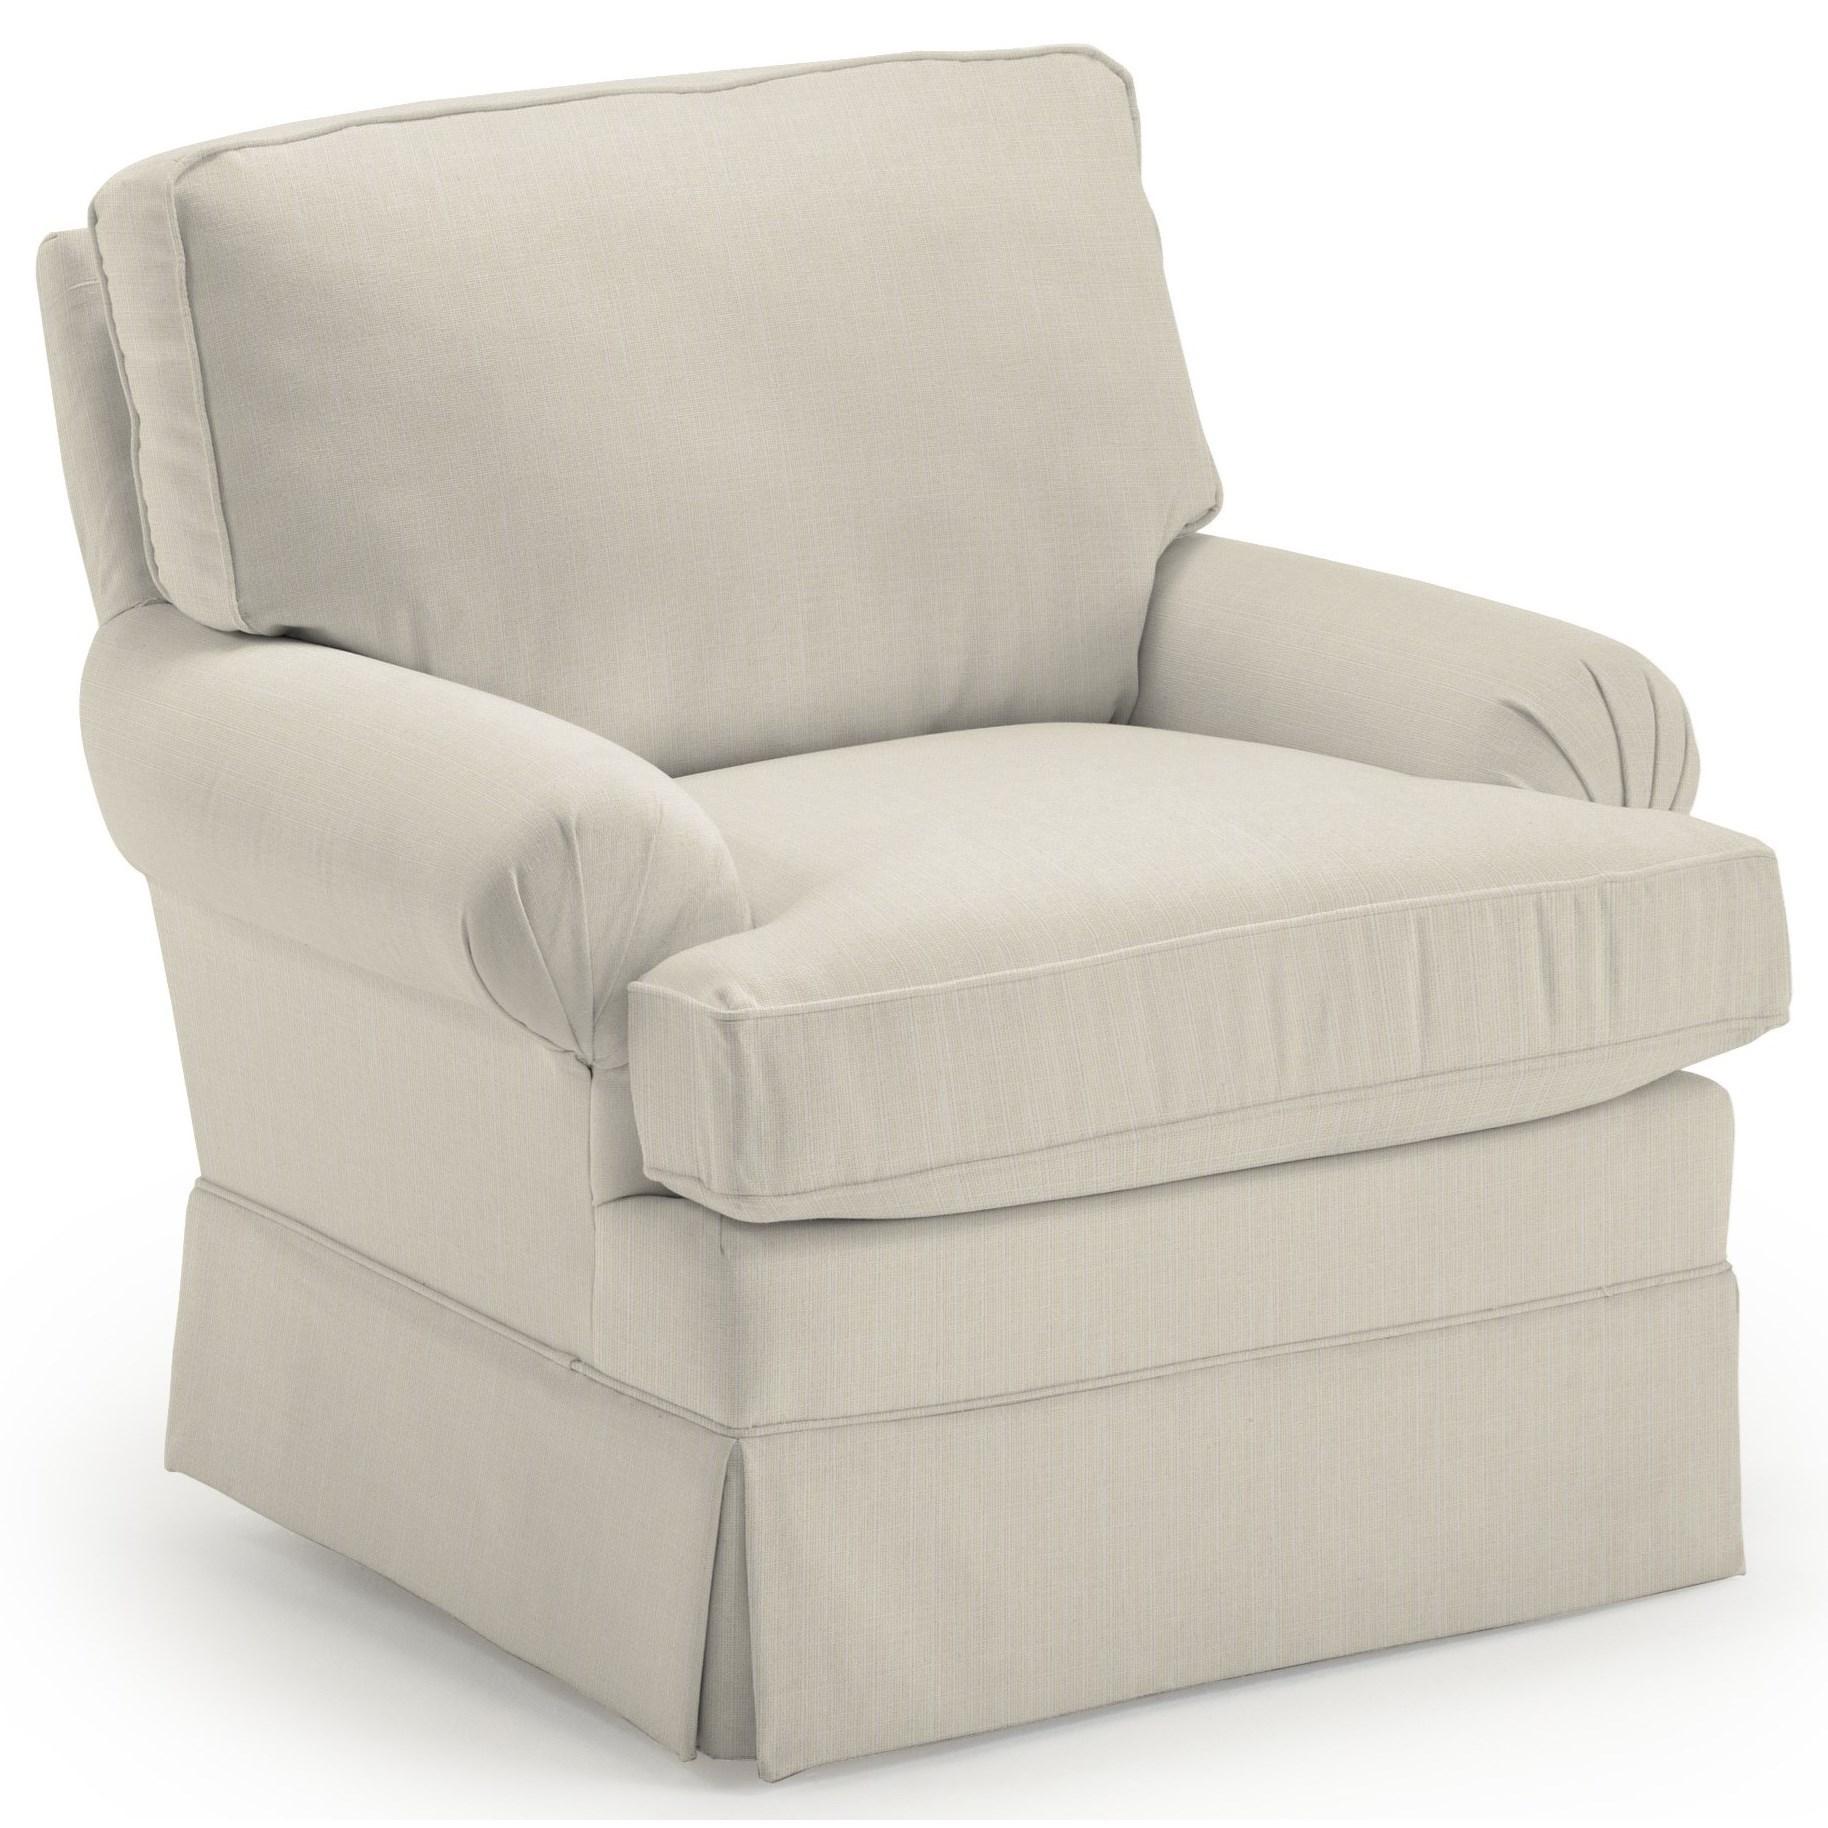 Charmant Best Home Furnishings KamillaKamilla Club Chair